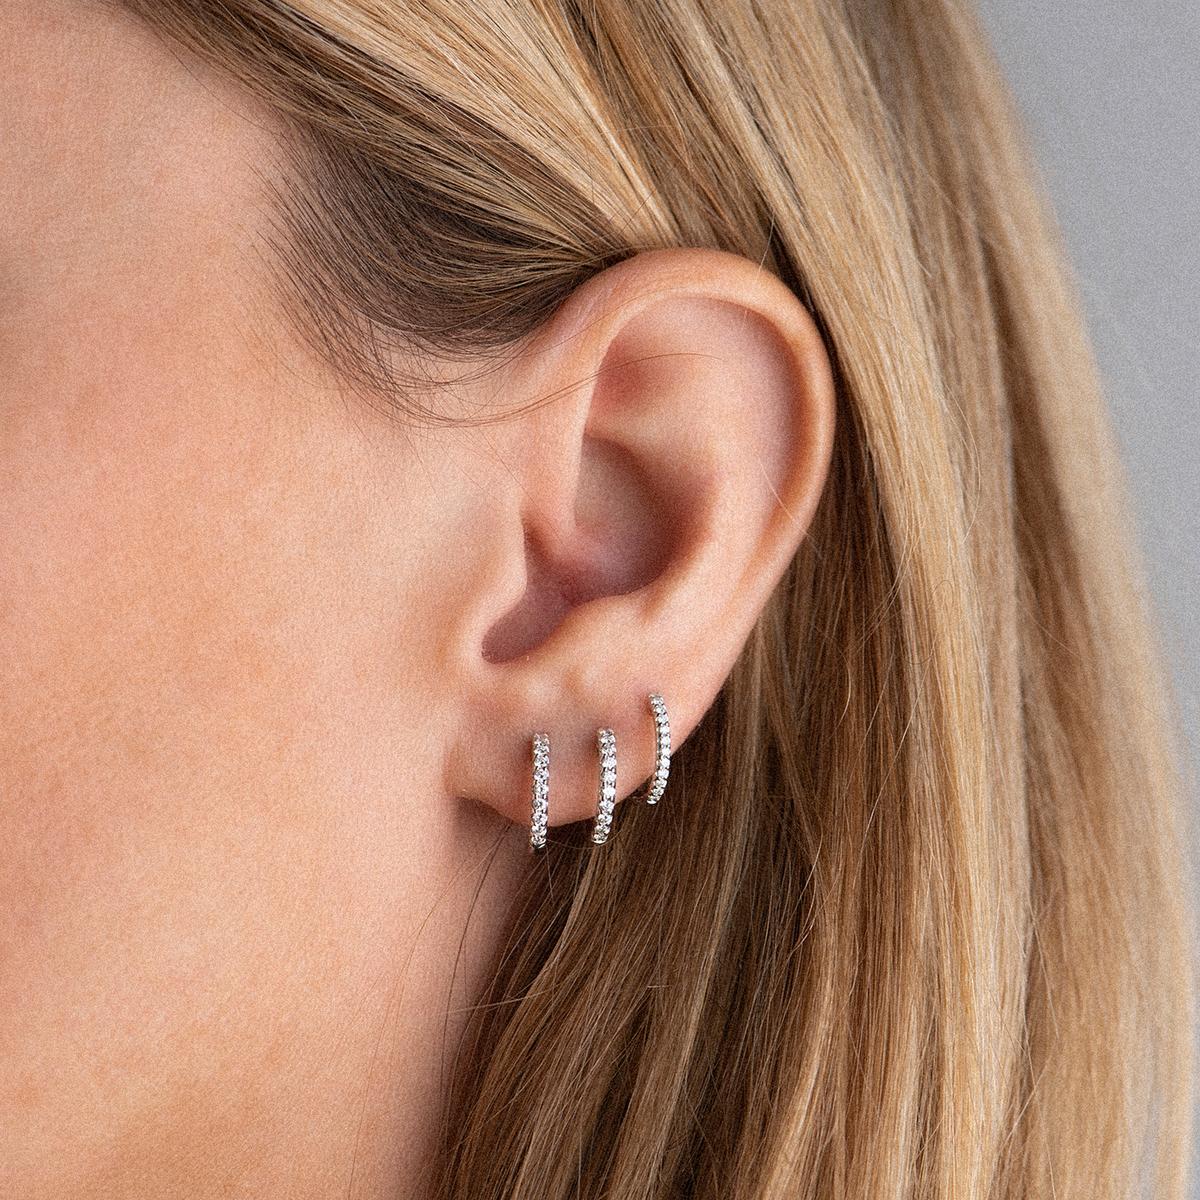 ischia basics earrings in yellow gold